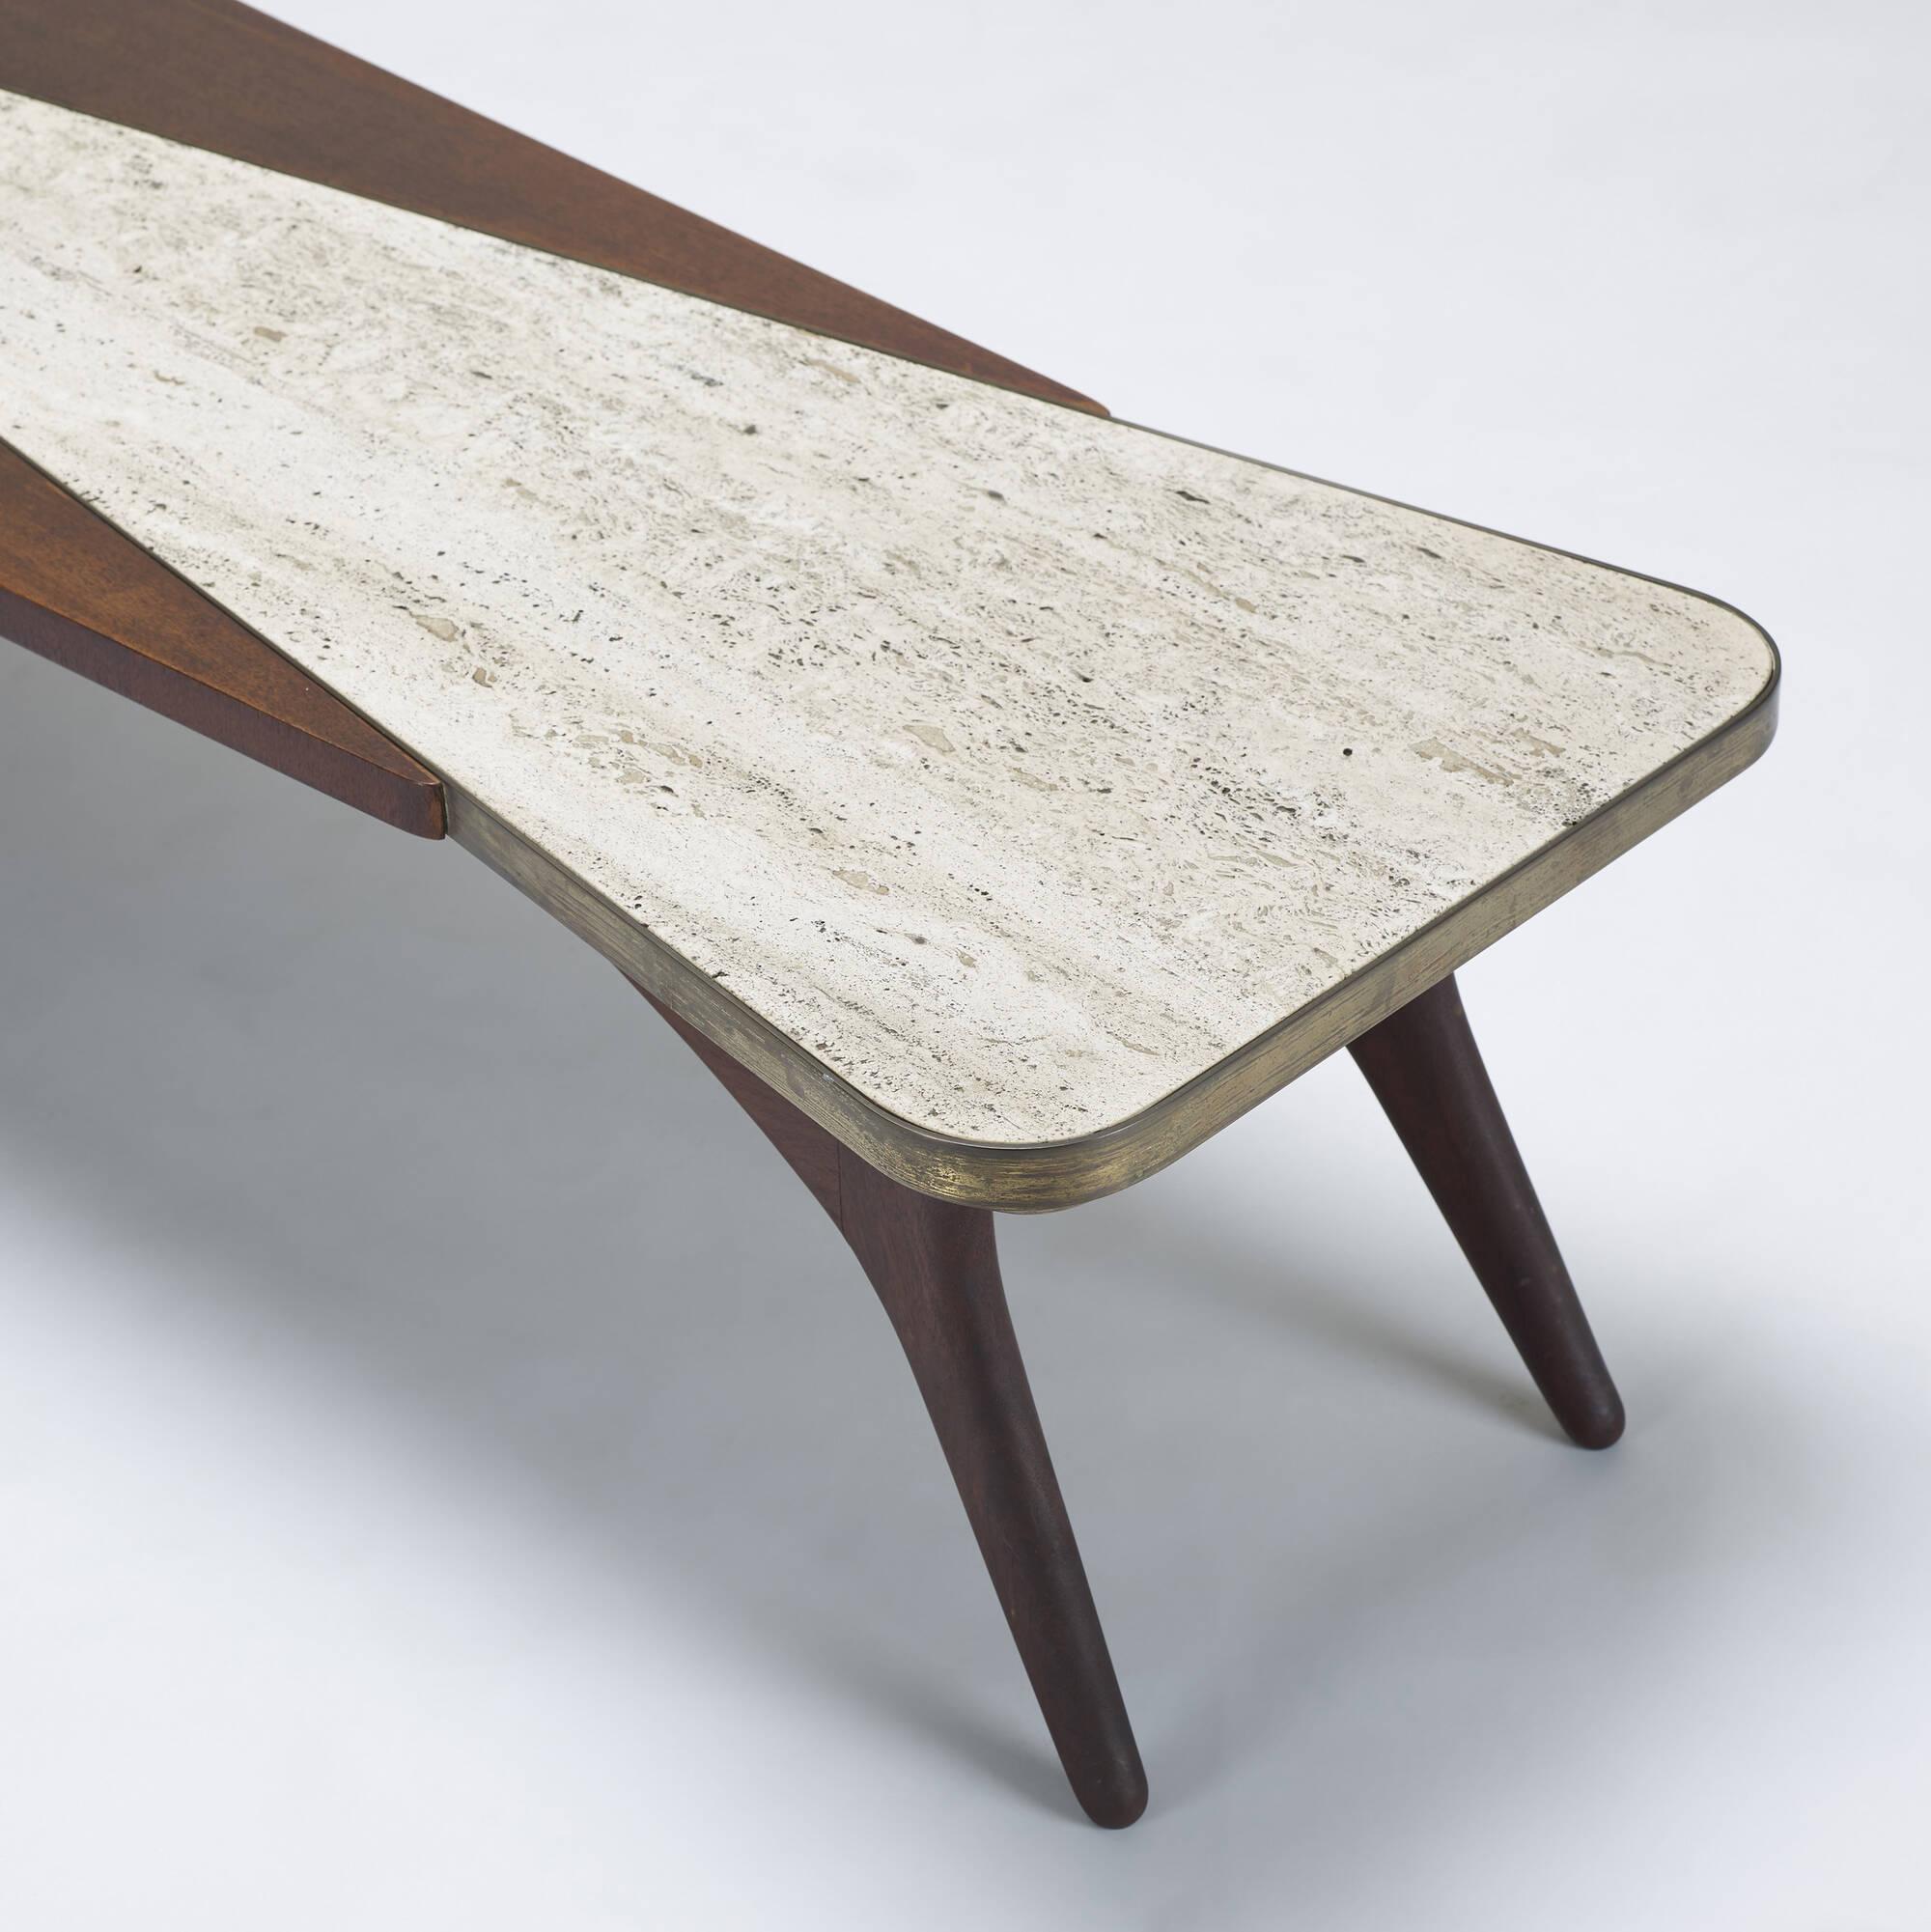 299: Vladimir Kagan / Coffee Table (3 Of 3)